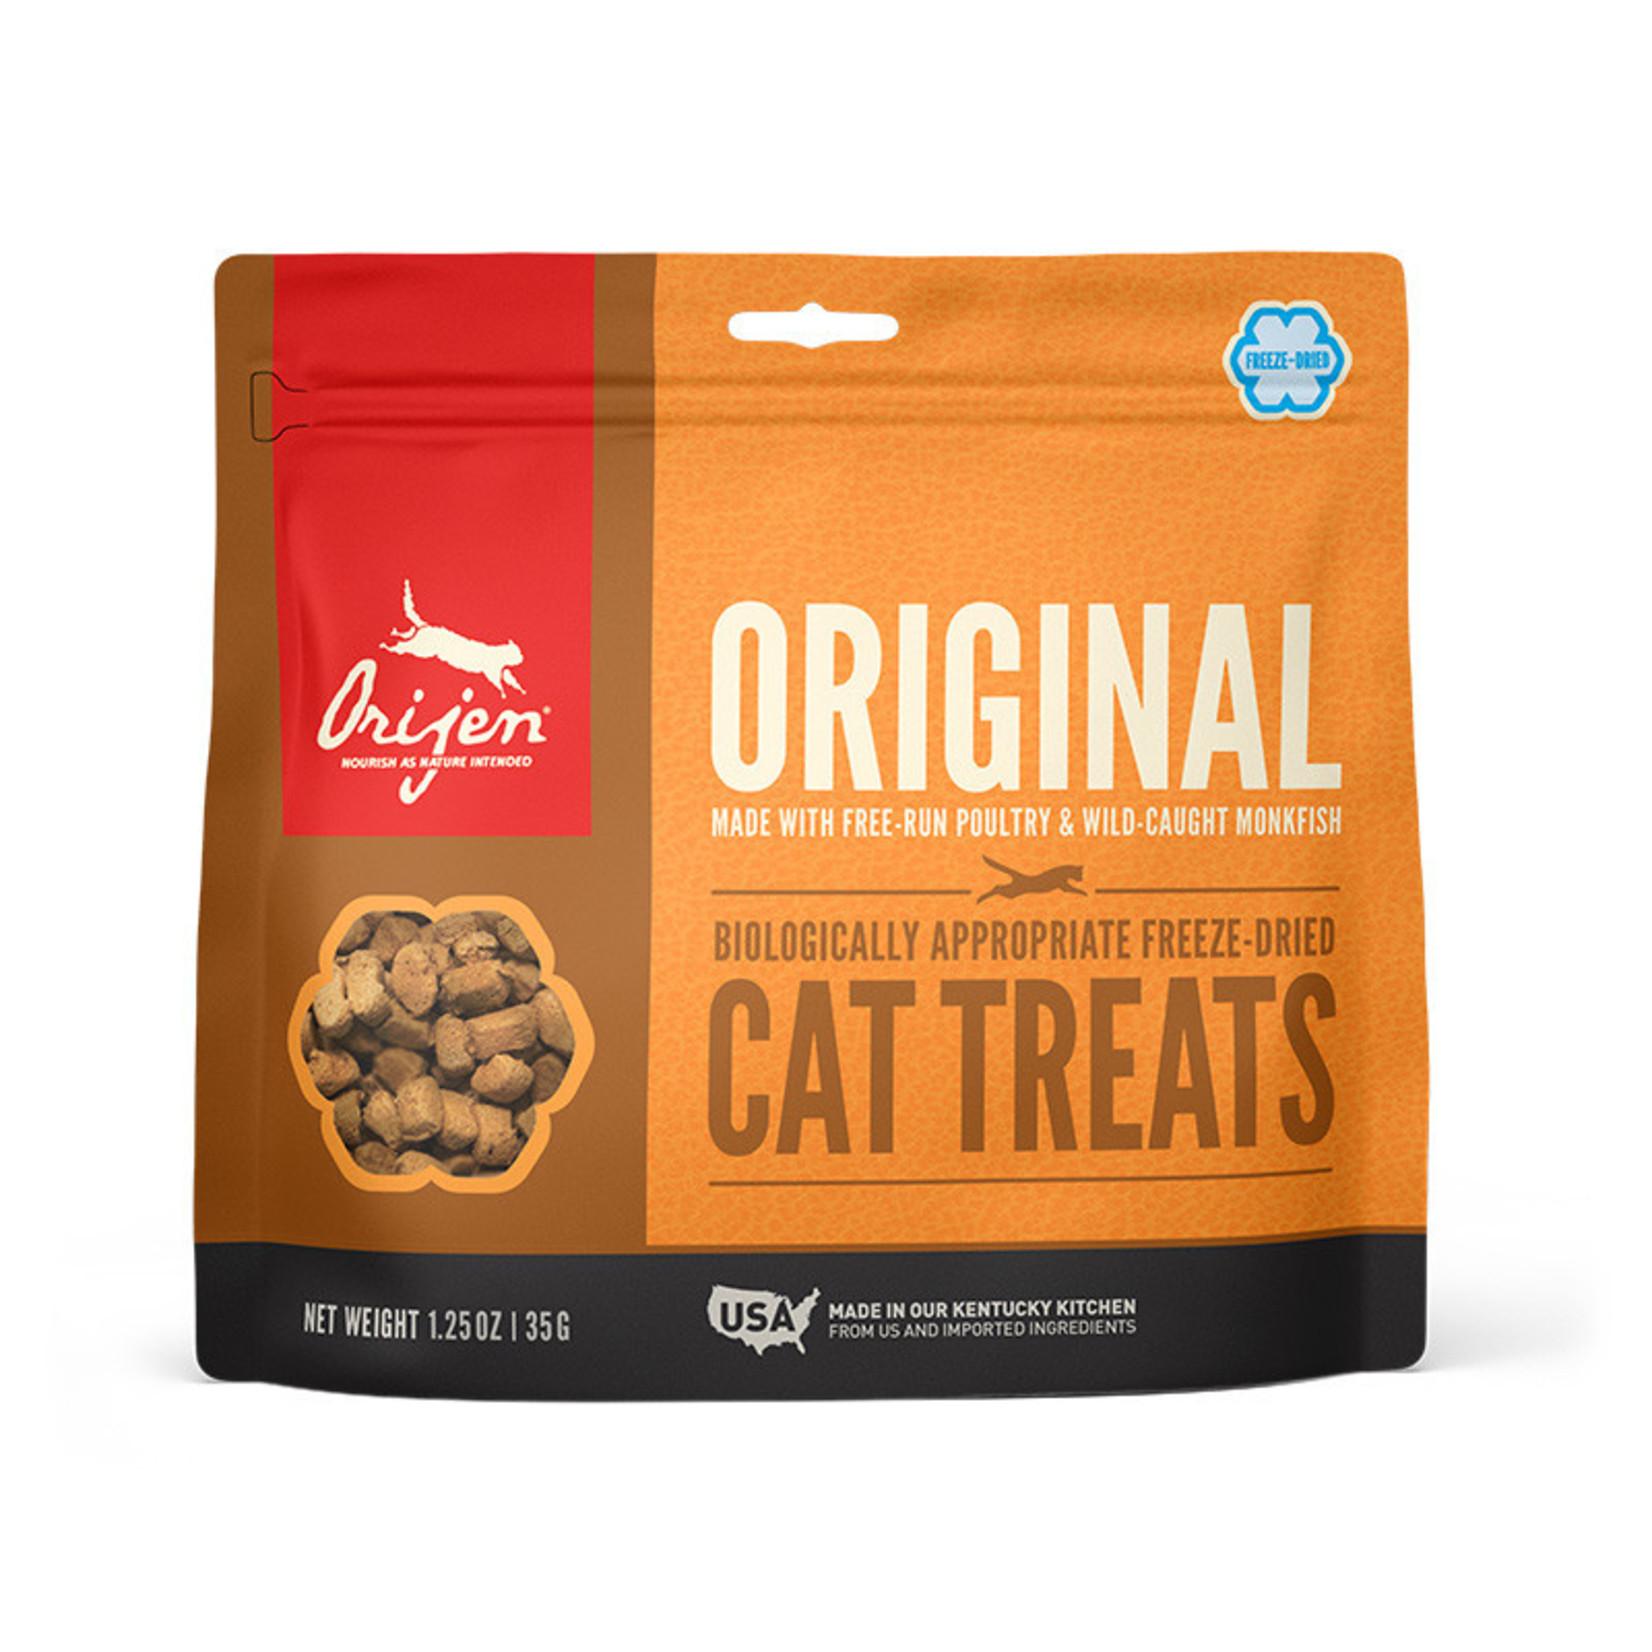 Champion Pet Foods Orijen Cat Freeze-dried Original Treat 1.25 OZ